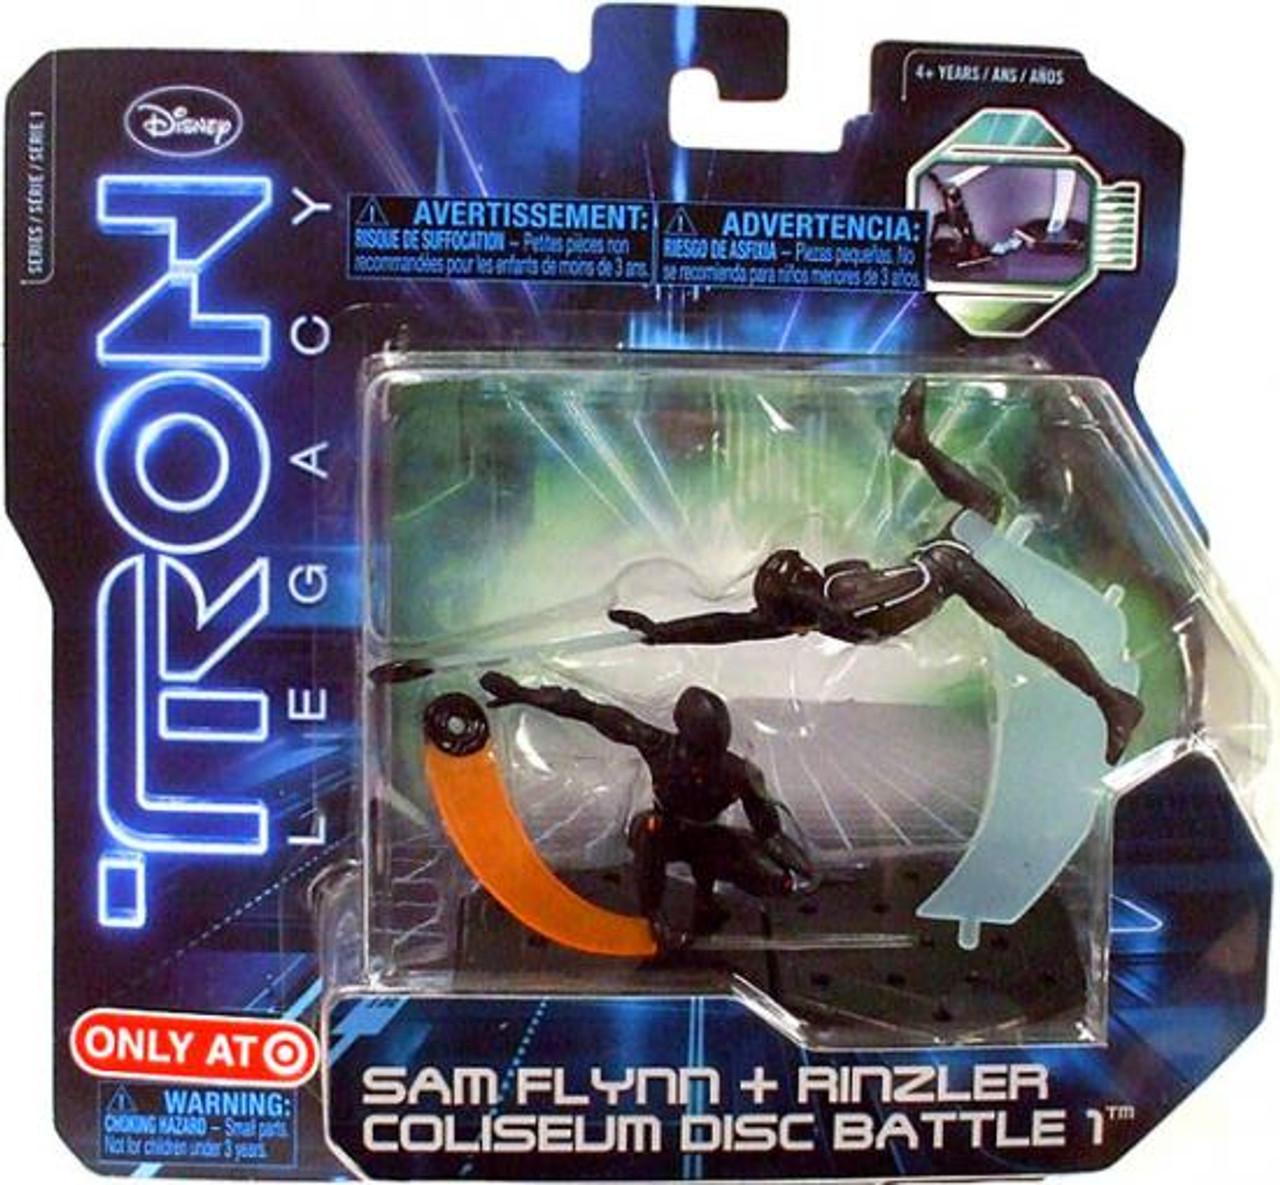 Tron Legacy Series 1 Sam Flynn & Rinzler Coliseum Disc Battle 1 Exclusive Figure 2-Pack